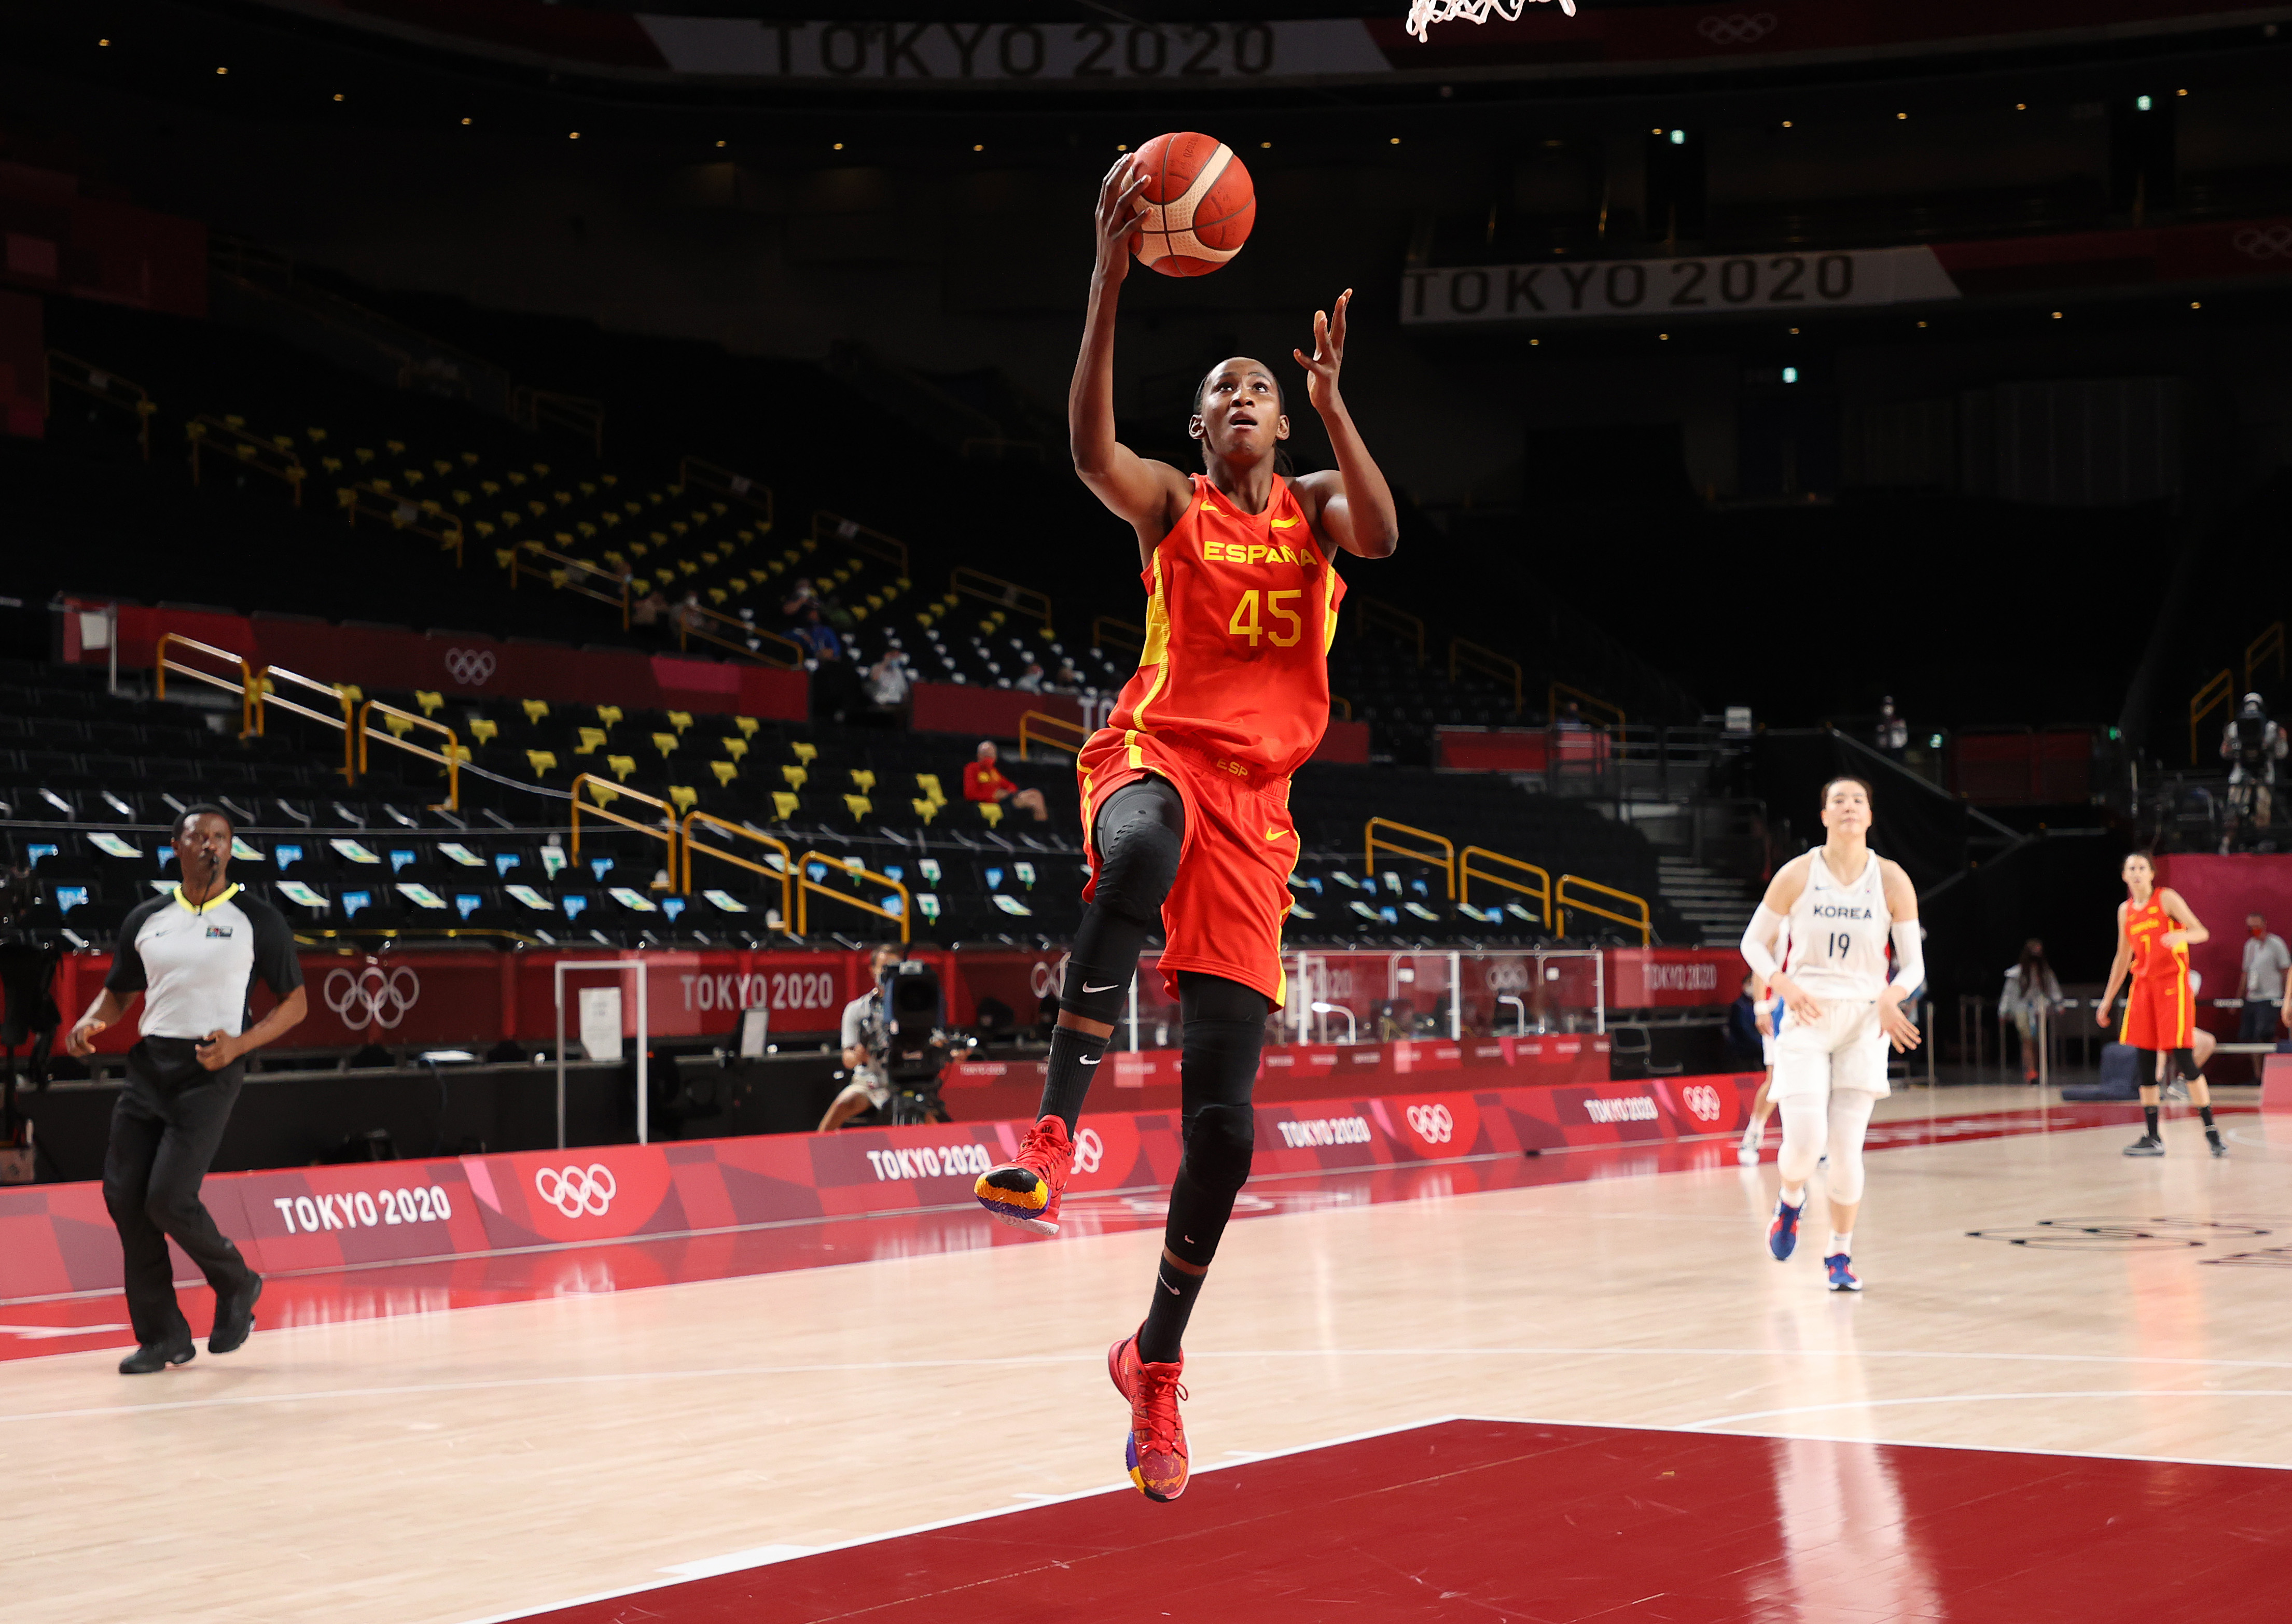 Republic of Korea v Spain Women's Basketball - Olympics: Day 3